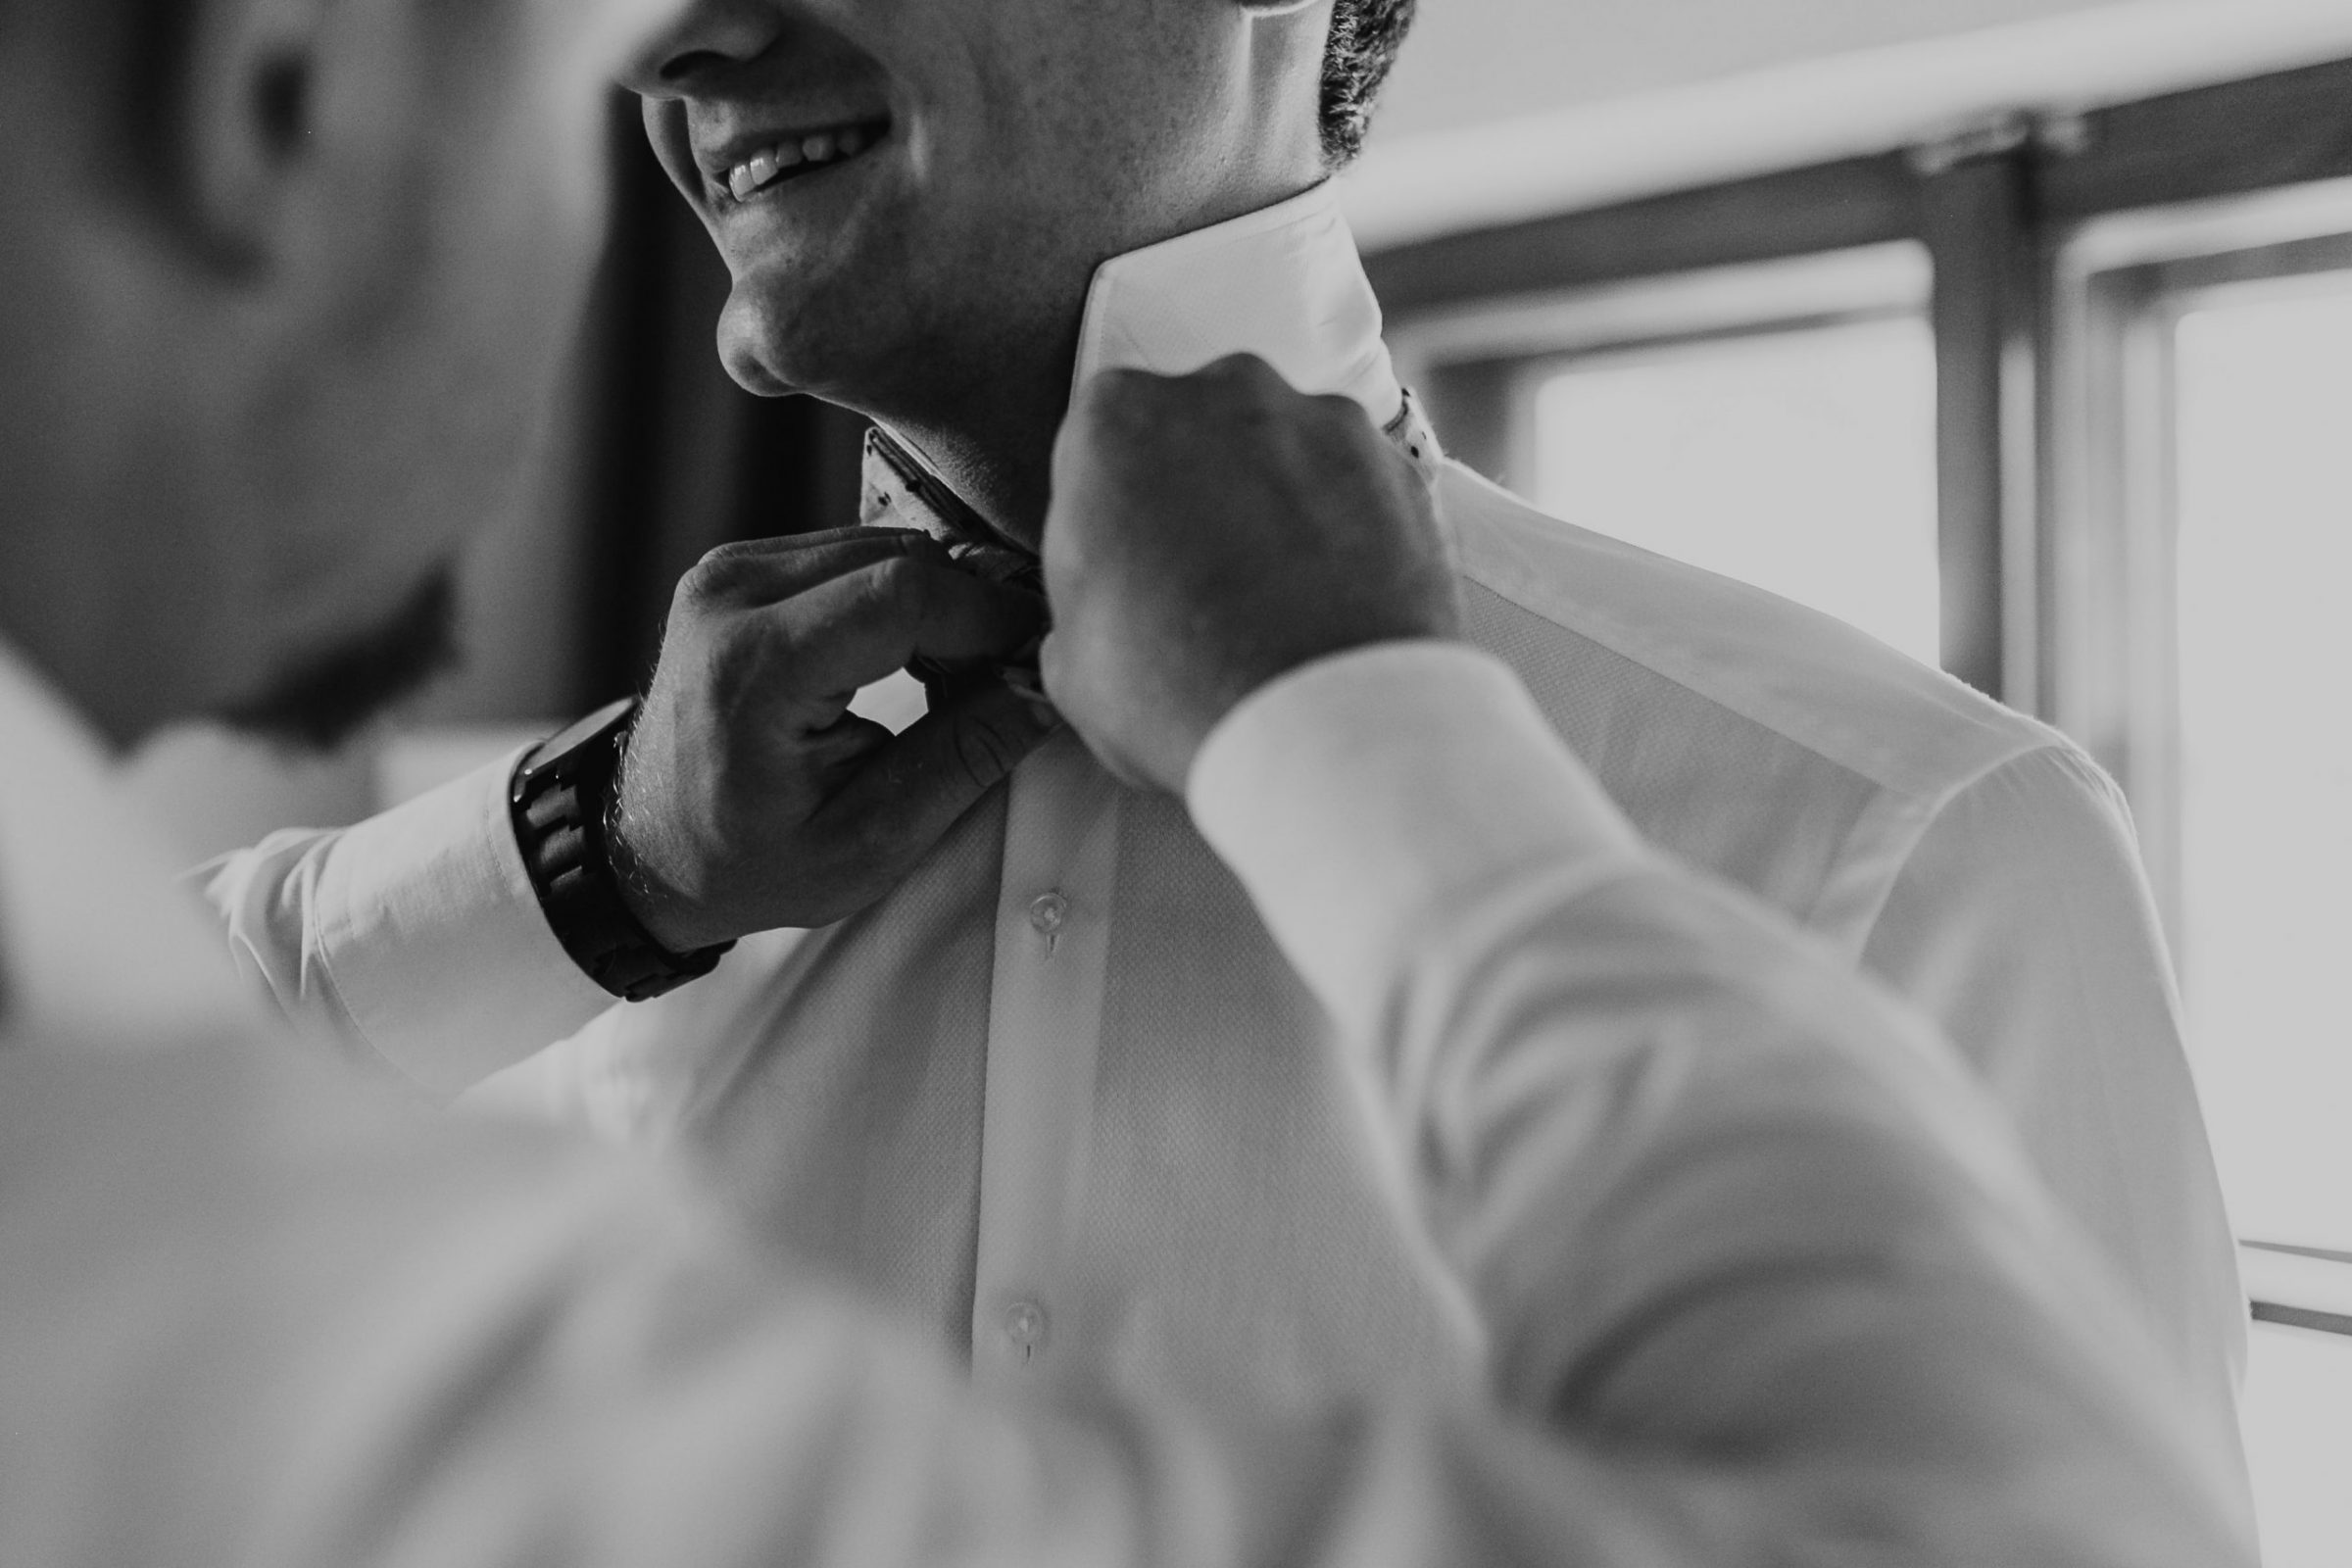 getting ready, groom getting ready, suit, bow tie, fliege, anzug, detailshot, detail, collar